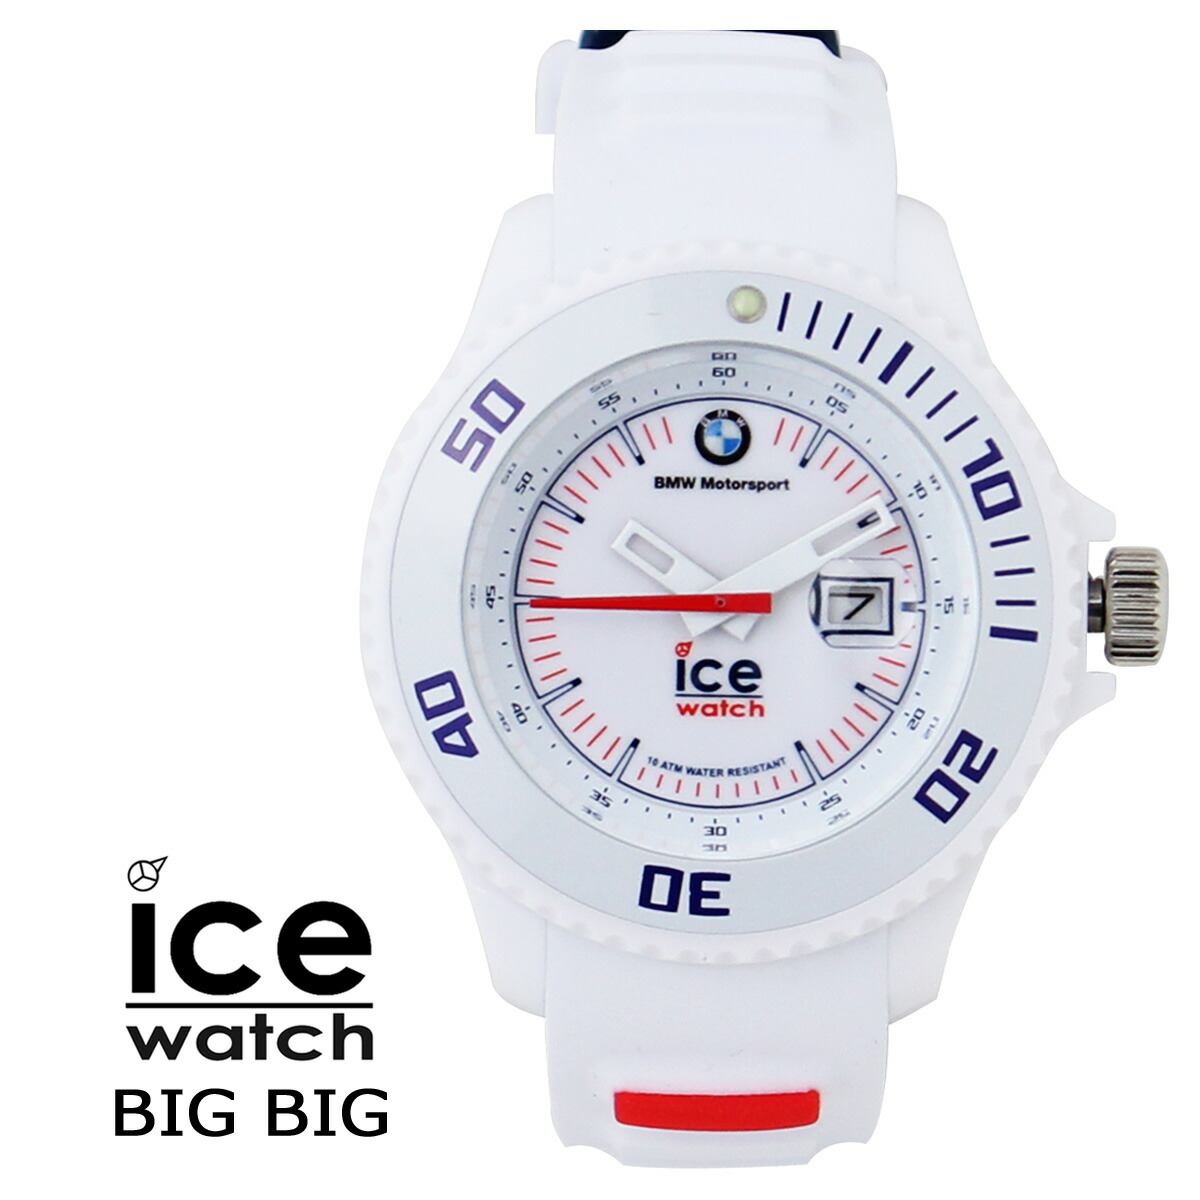 ztn-ice150711-01-a.jpg